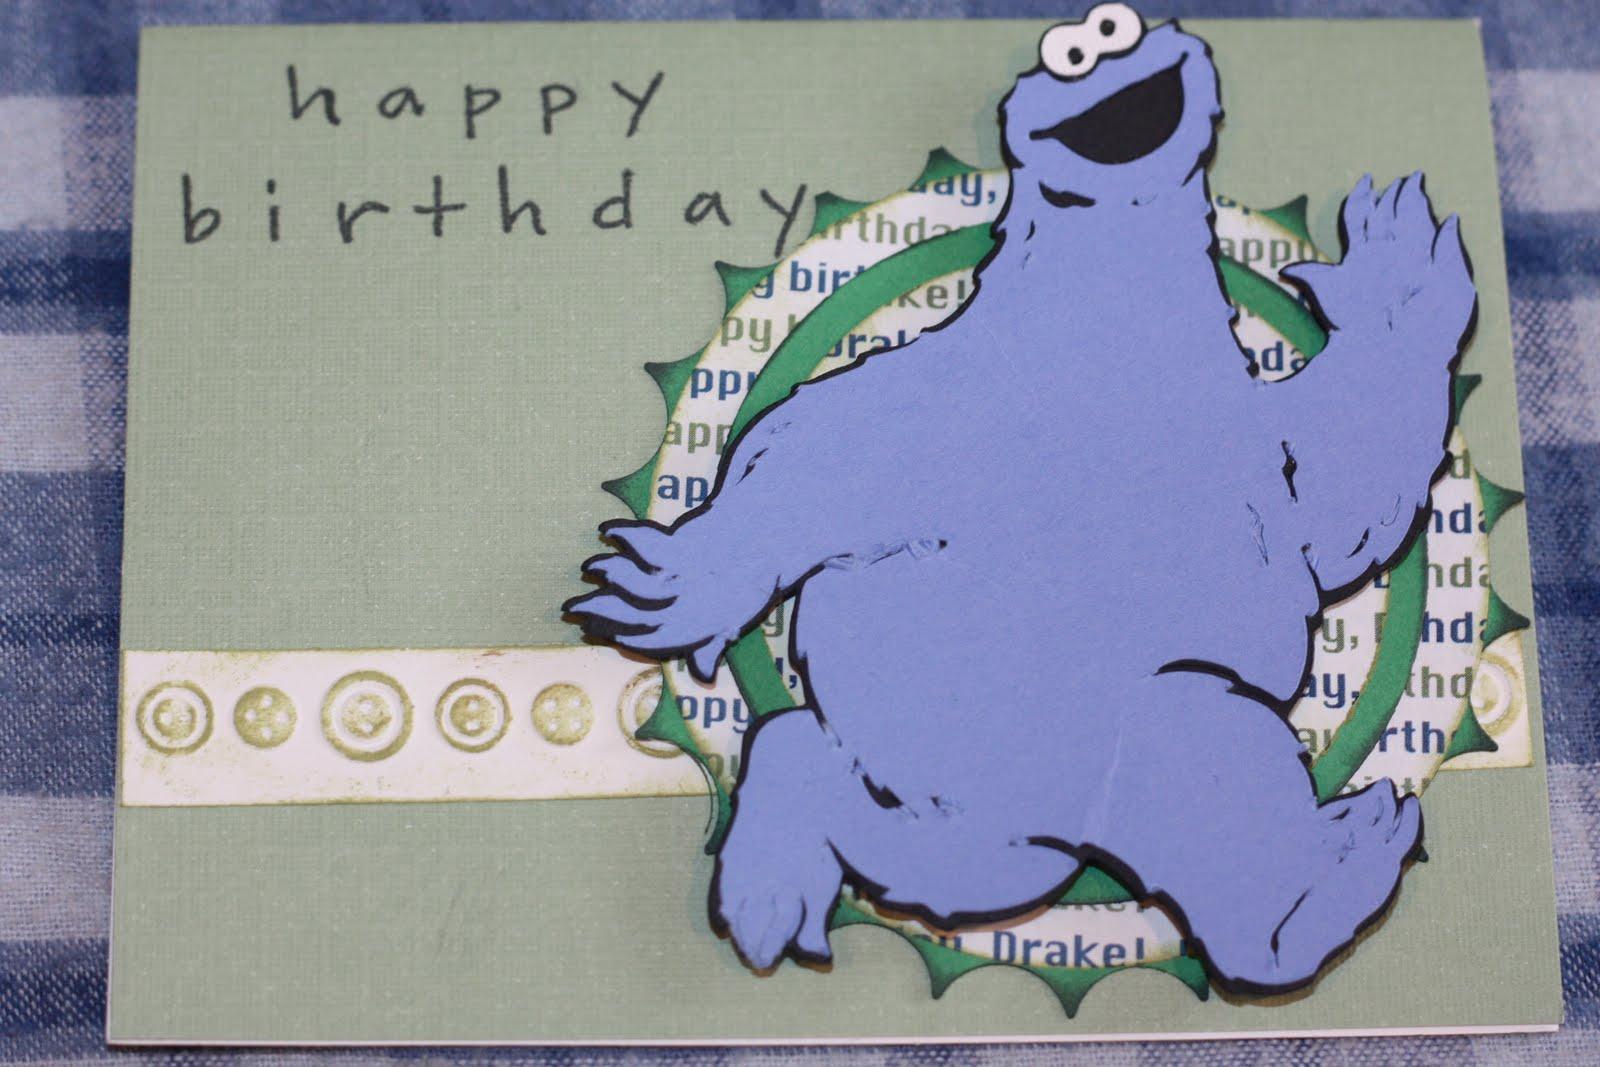 June scraps cookie monster birthday card cookie monster birthday card bookmarktalkfo Choice Image